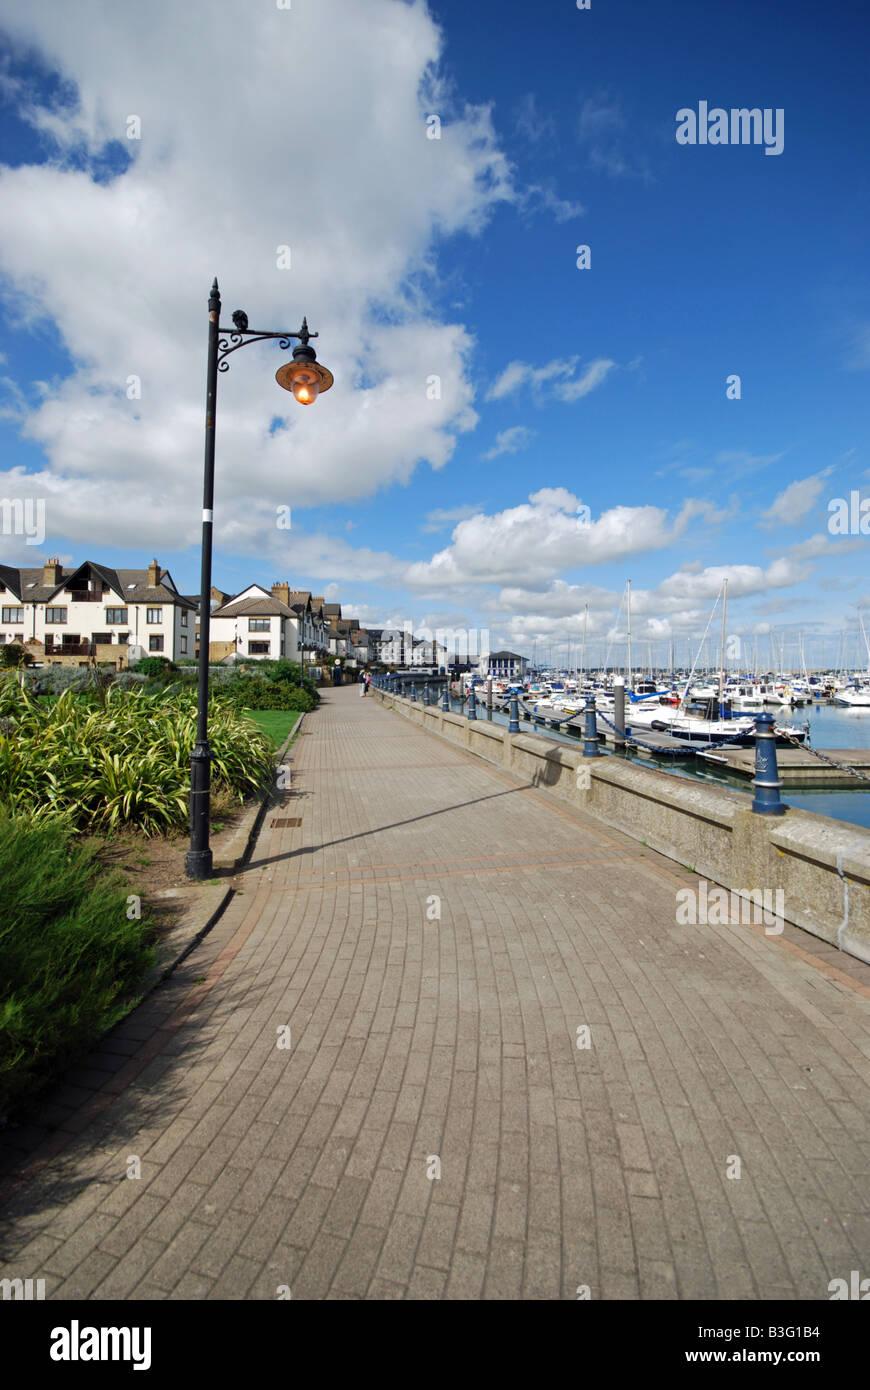 Marina Village, Malahide, Co Dublin, Ireland - Stock Image